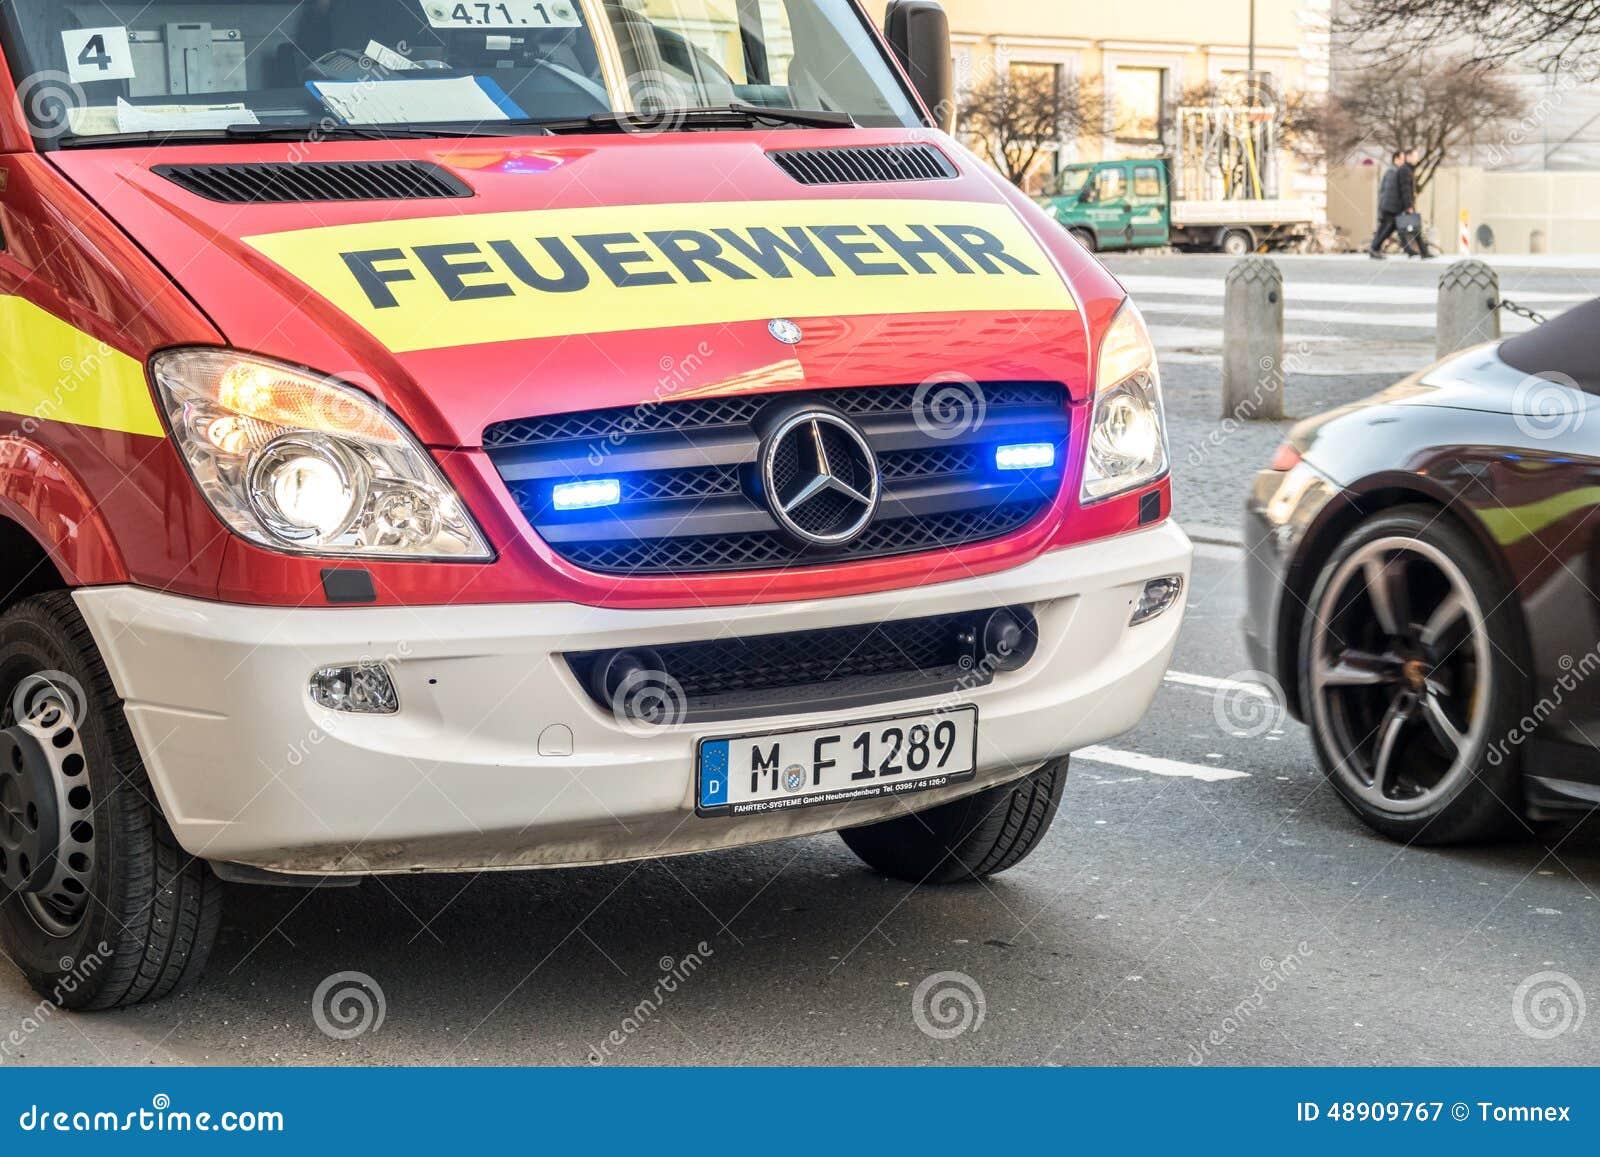 German fire brigade